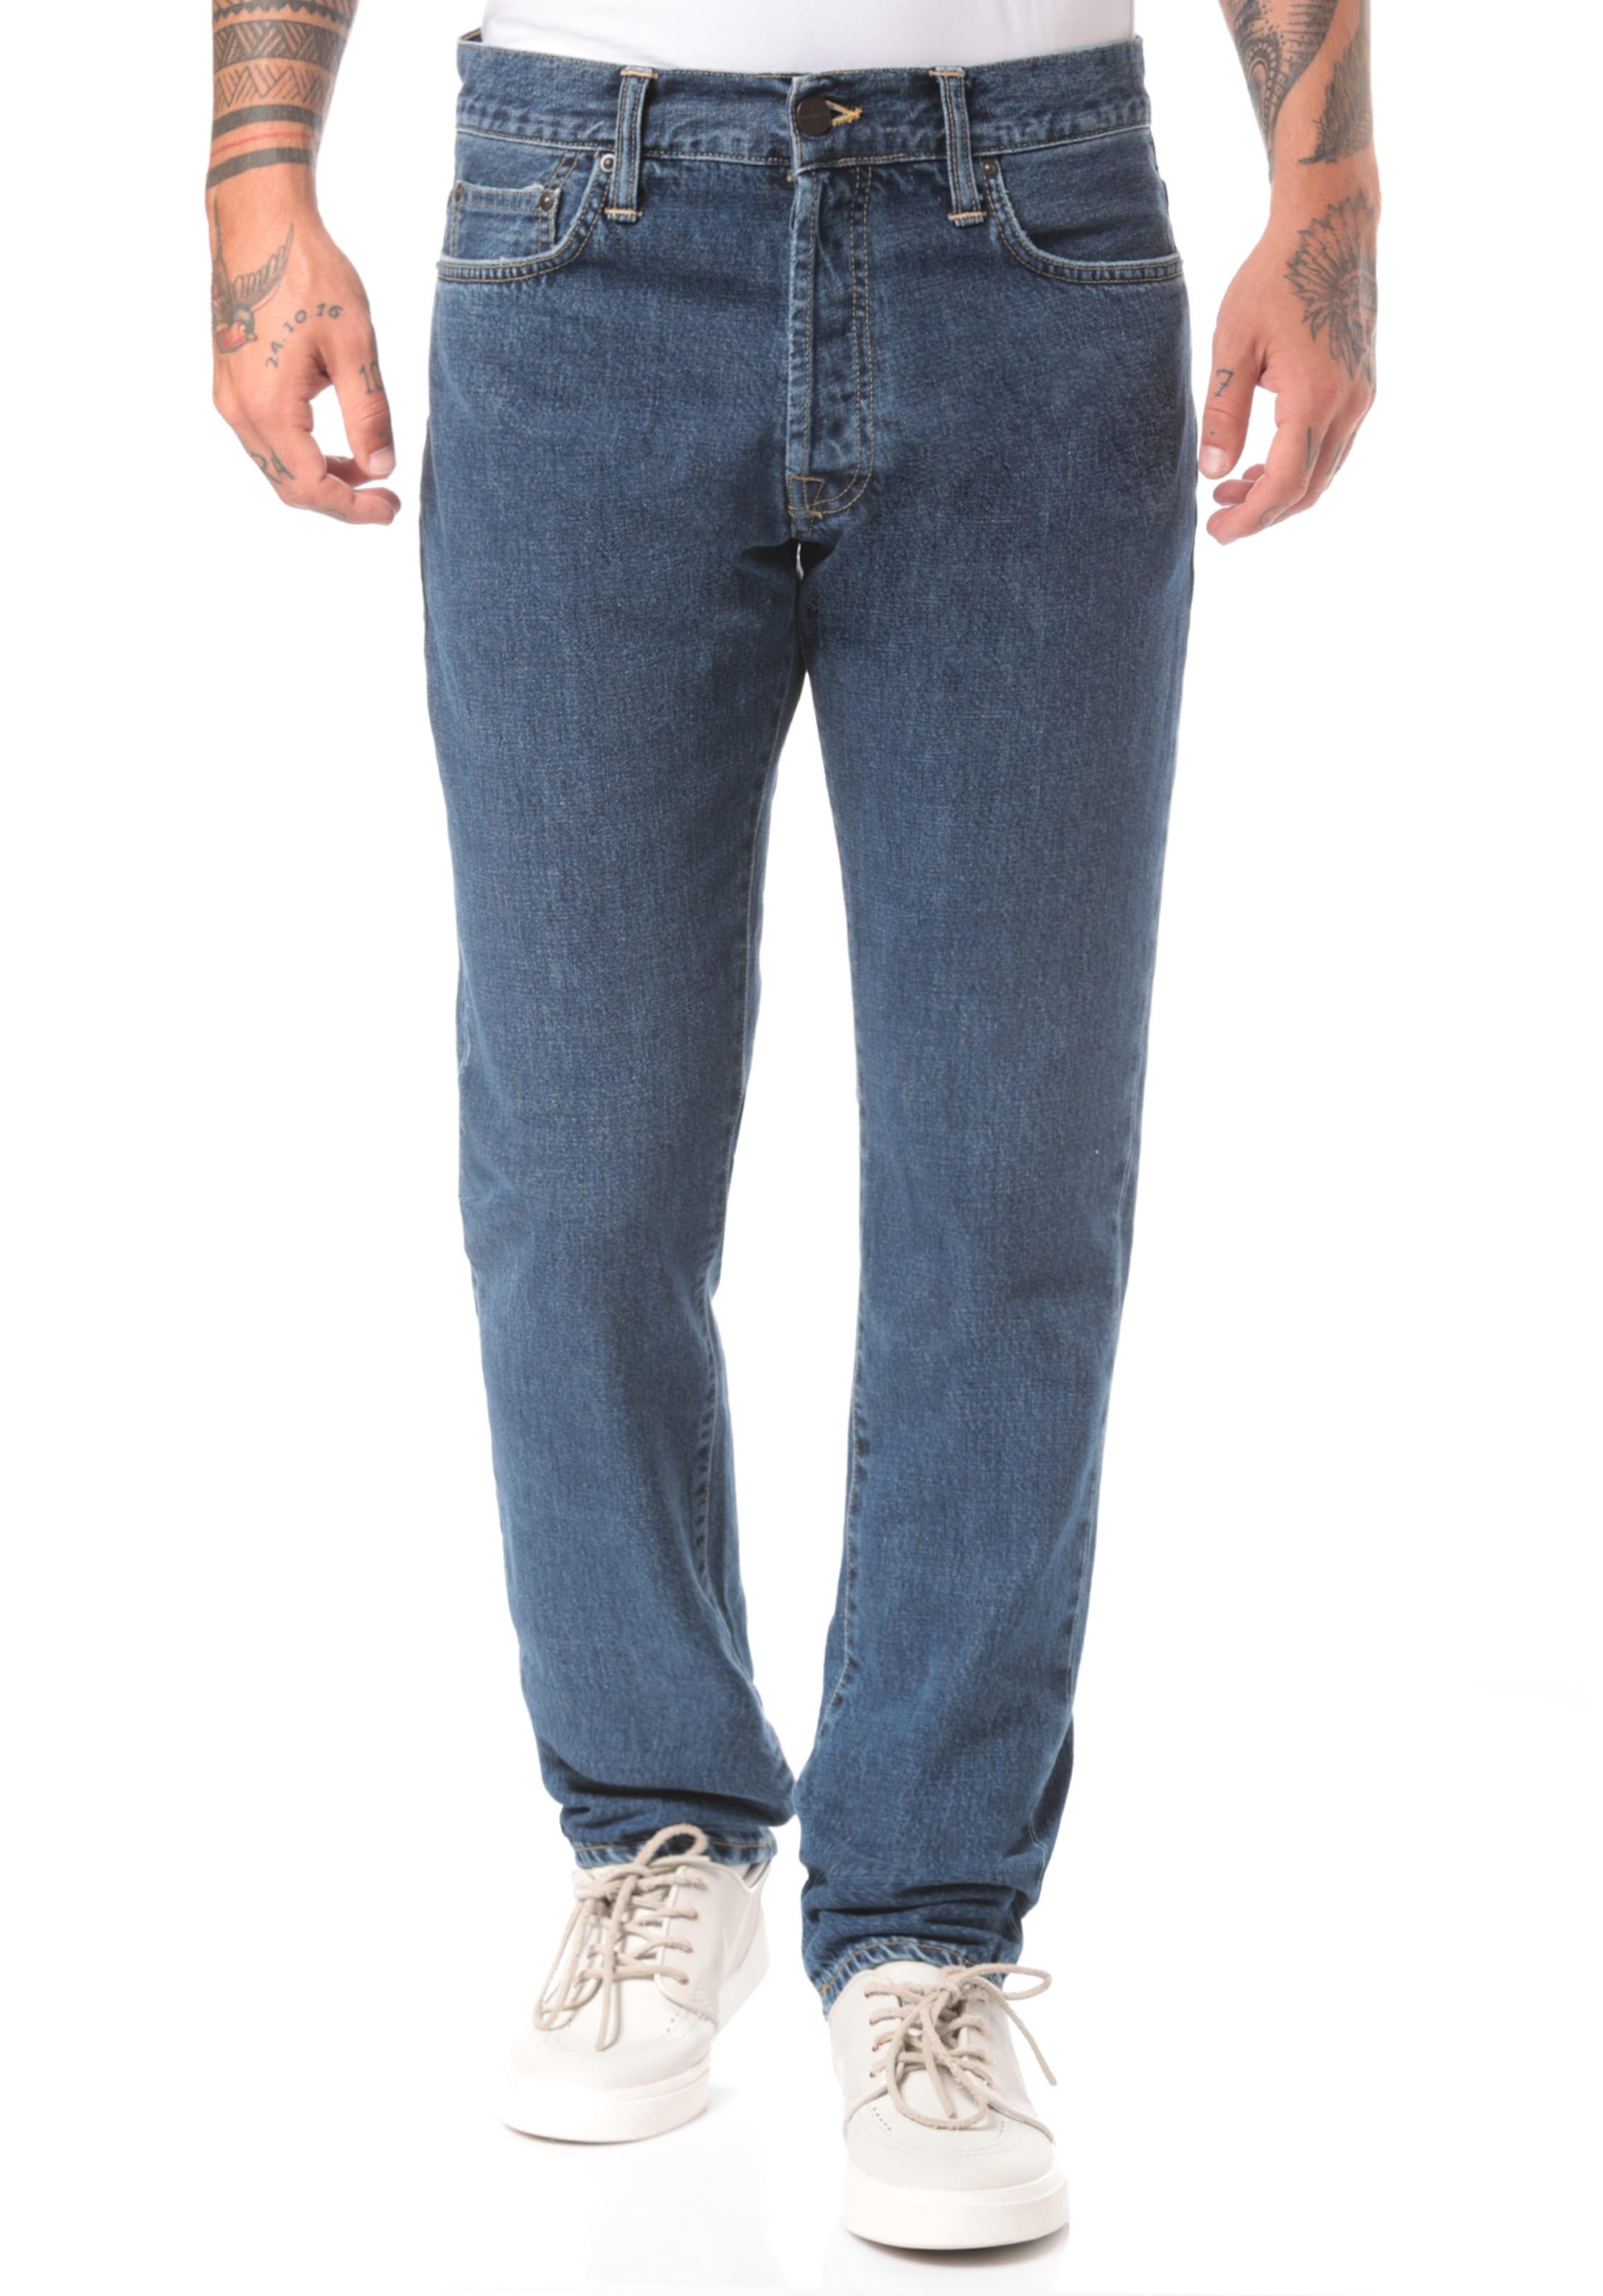 Blau Carhartt Jeans In 'klondike Wip Ii' xhQBtdrsC